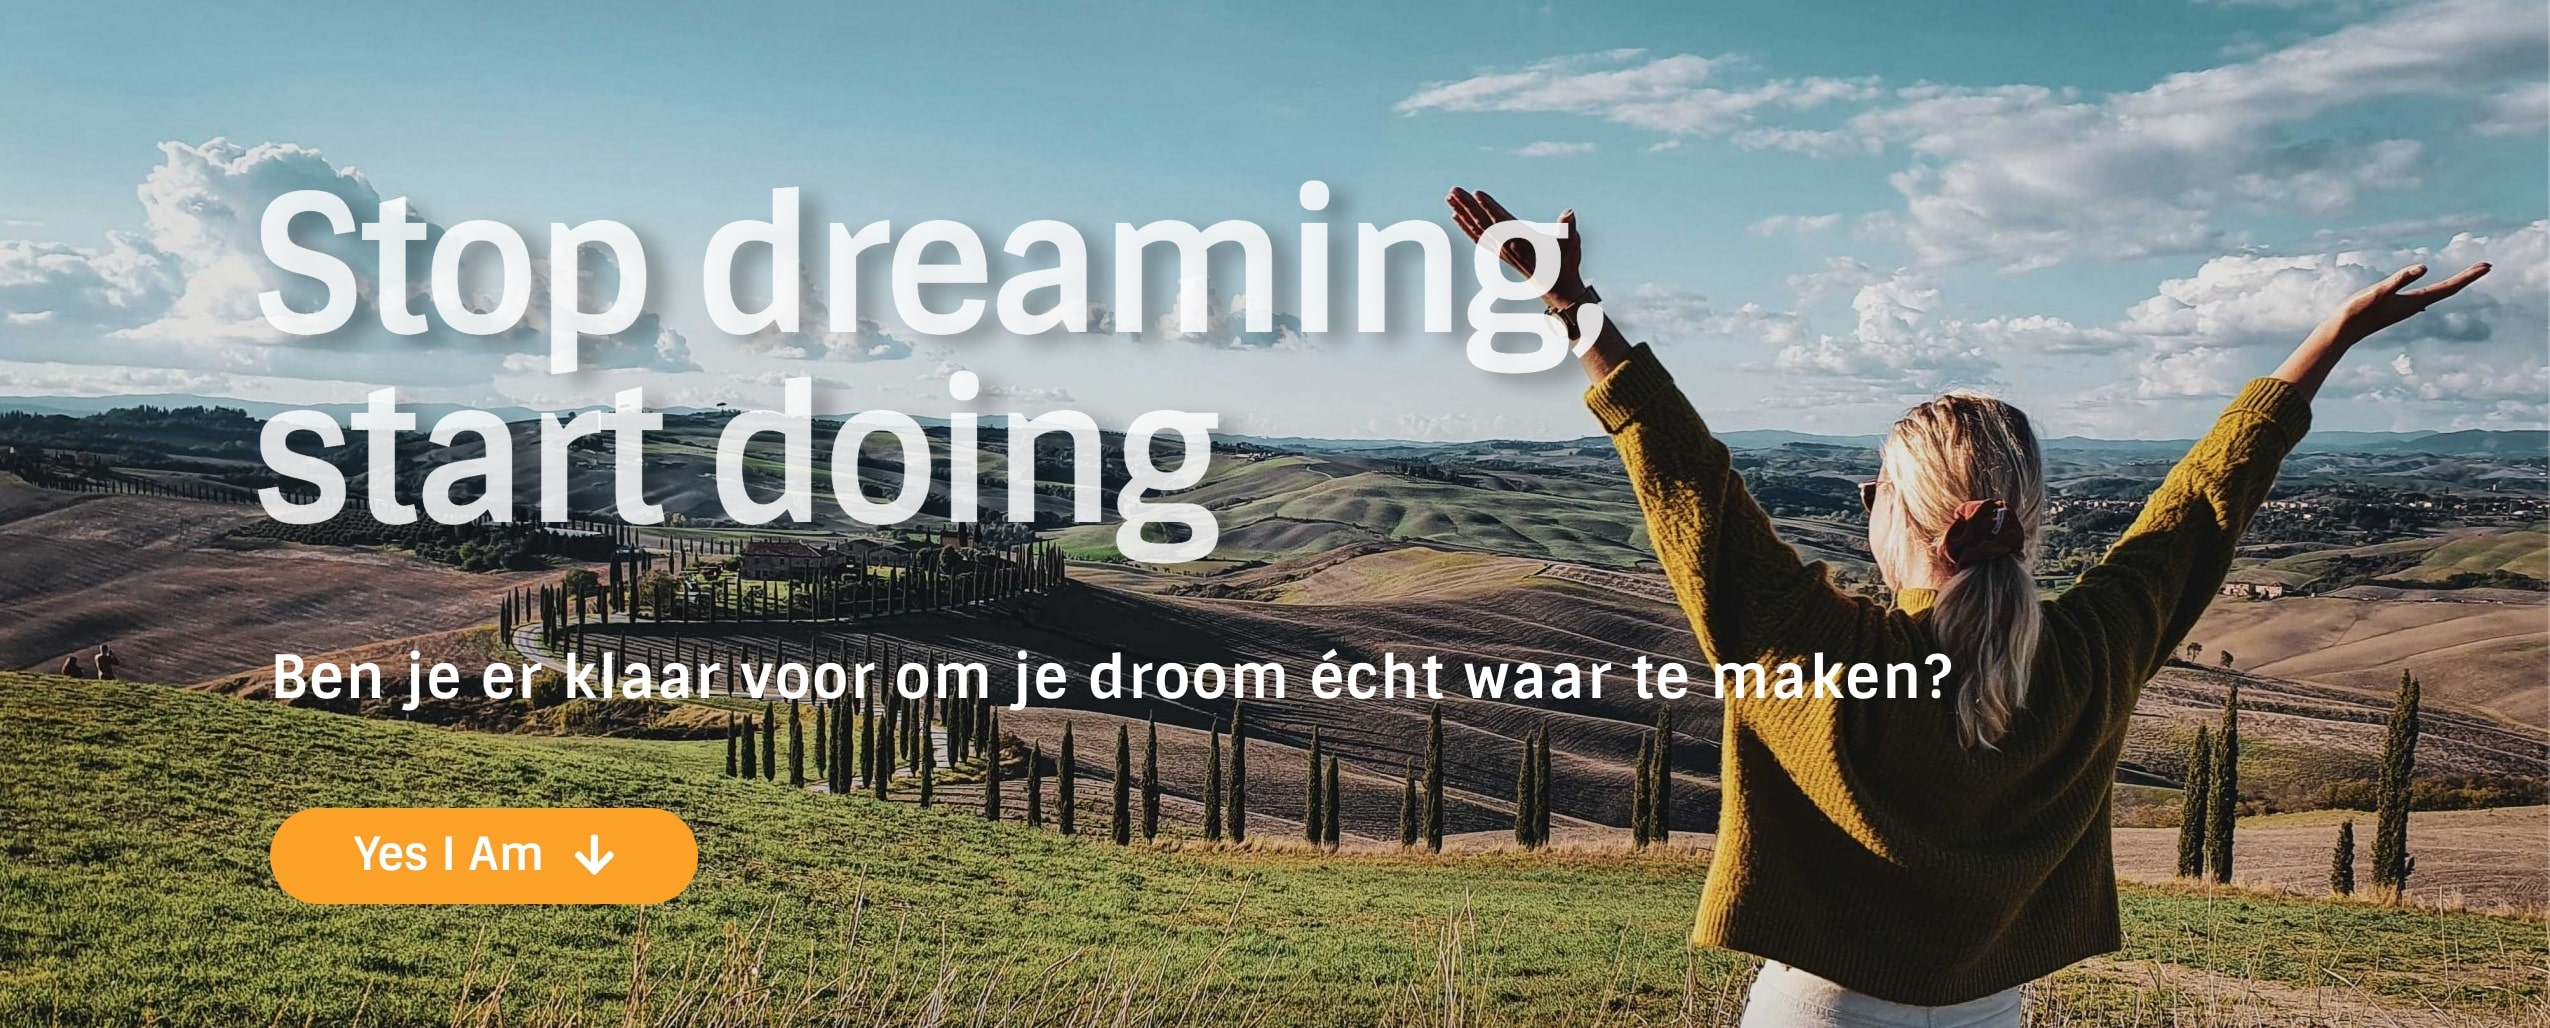 Dromen realiseren kun je leren